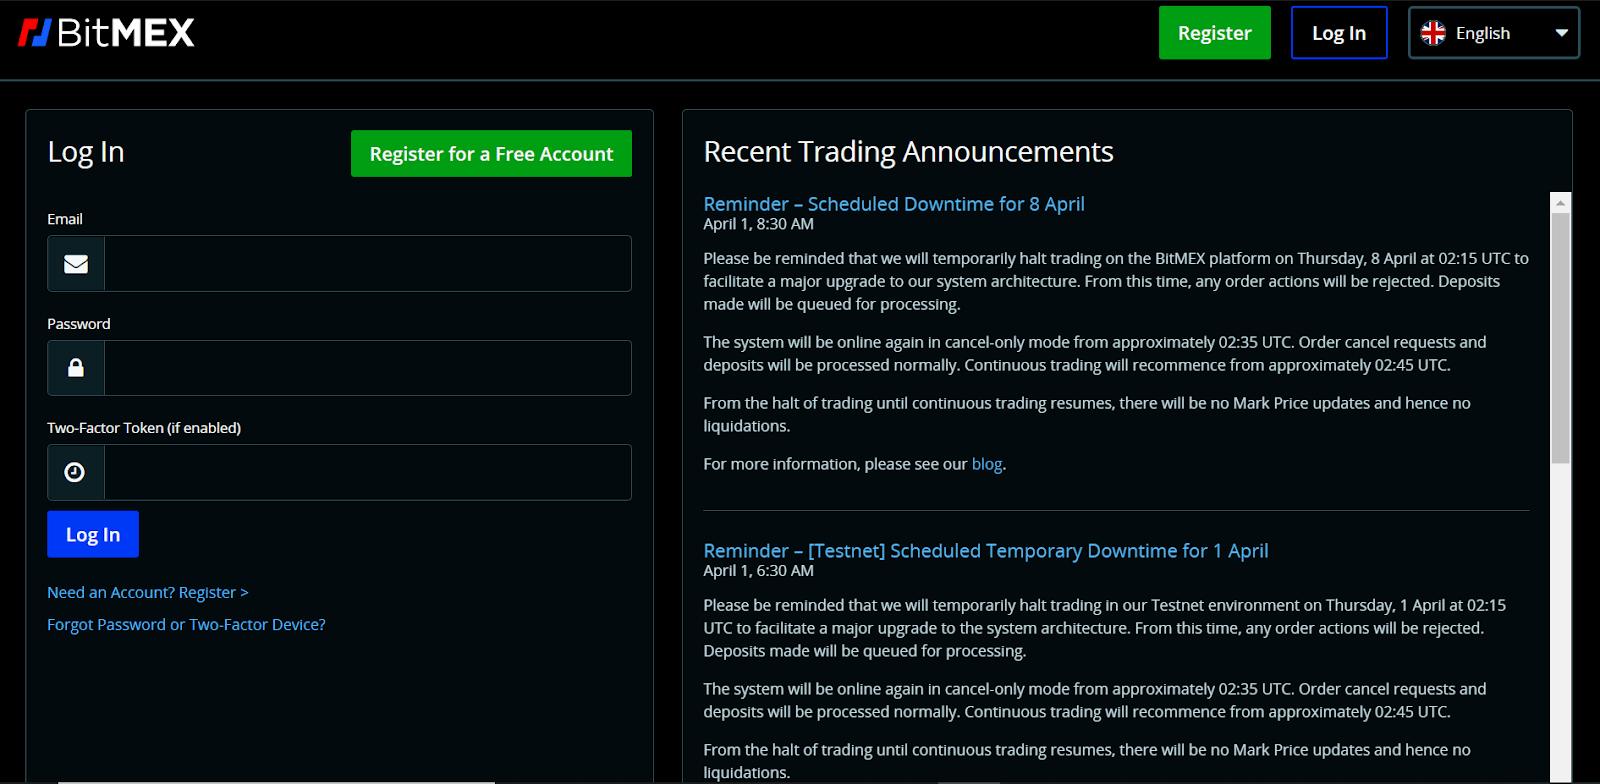 BitMEX sign up